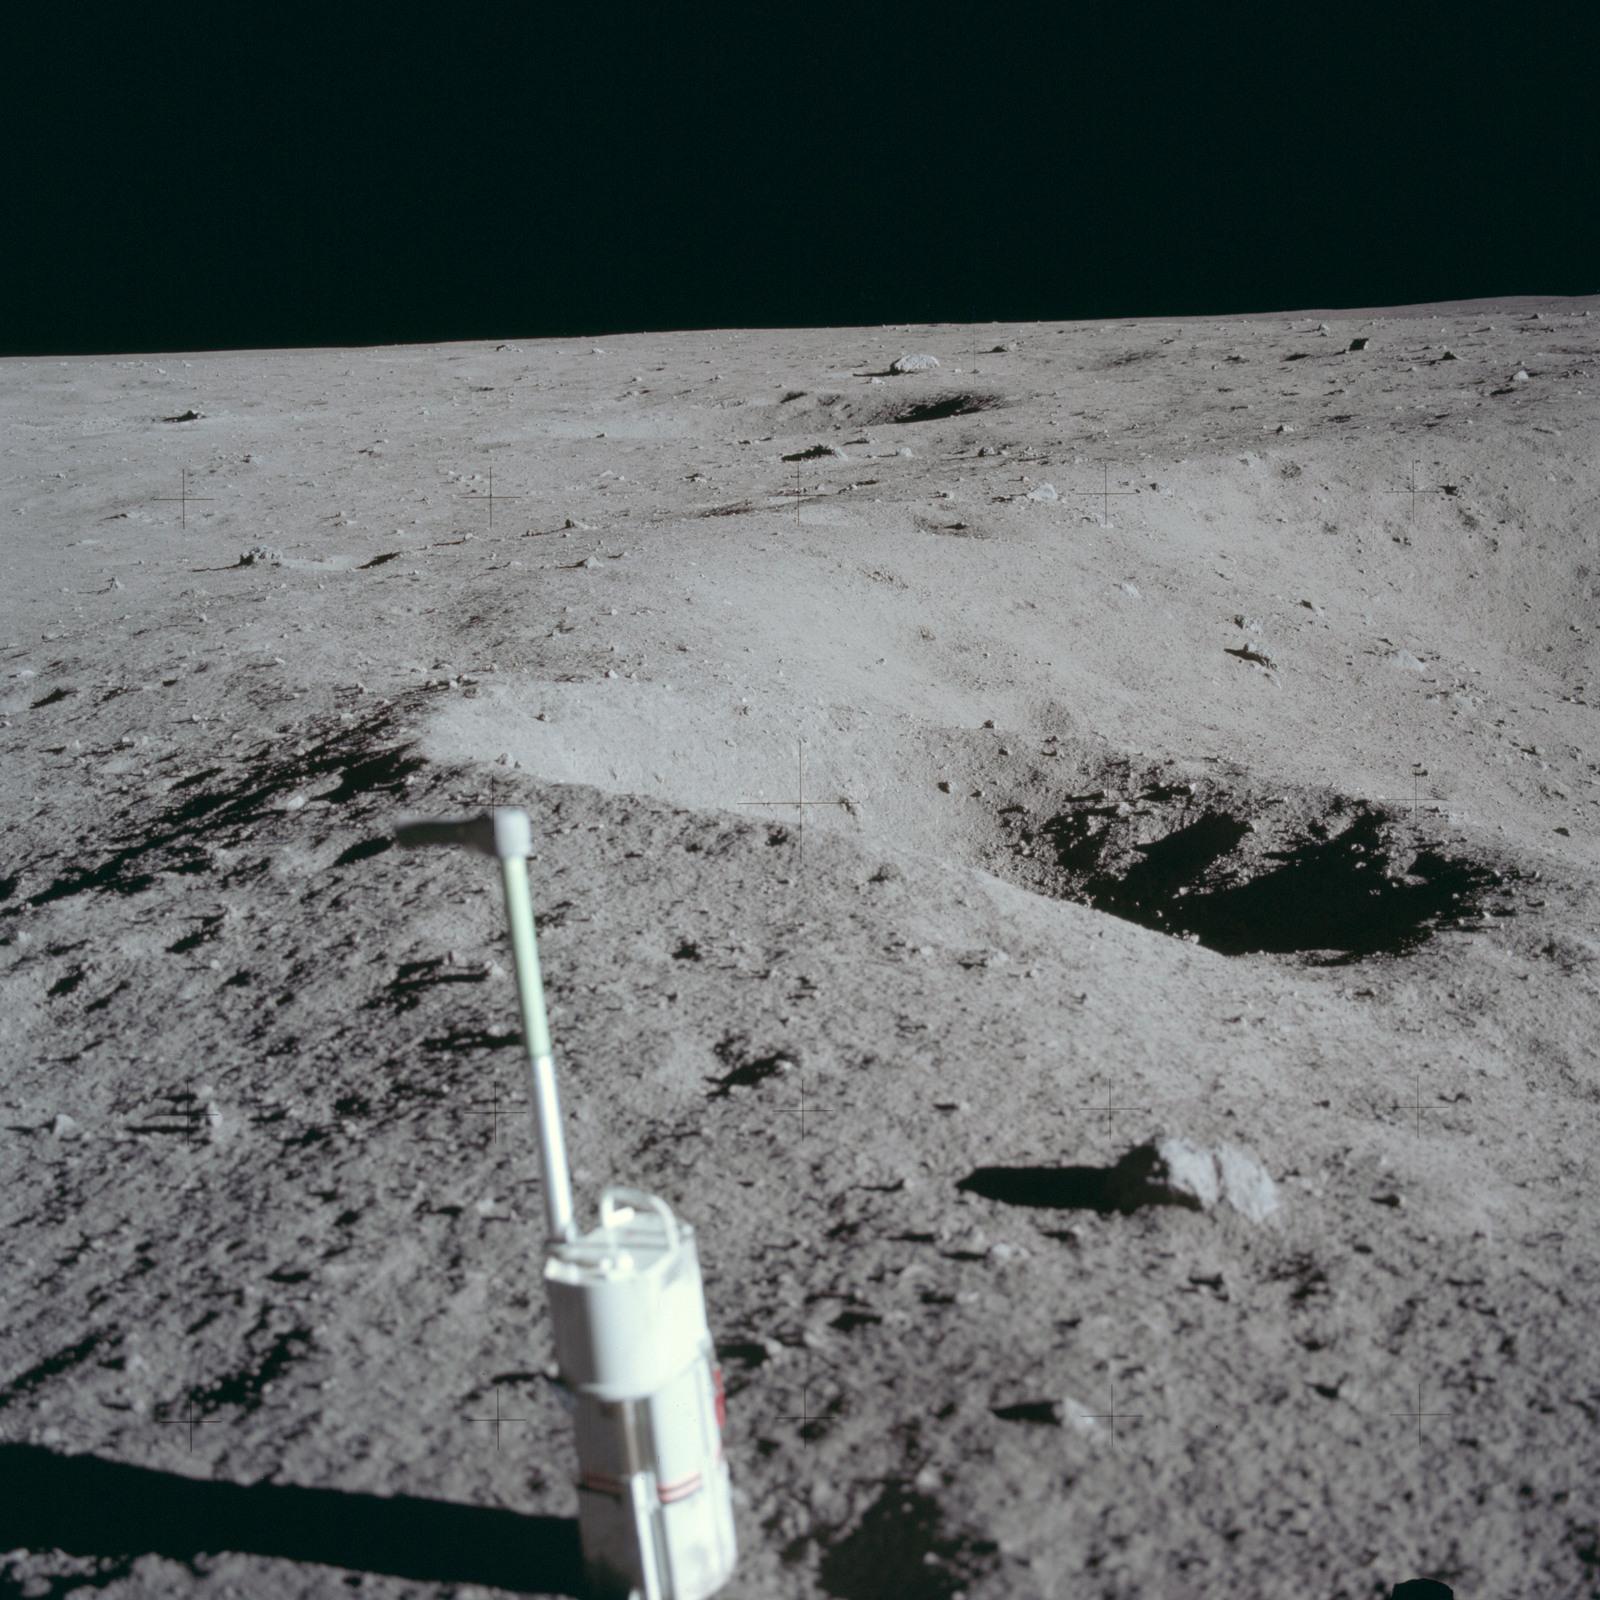 AS11-40-5959 - Apollo 11 - Apollo 11 Mission image - Lunar surface and horizon